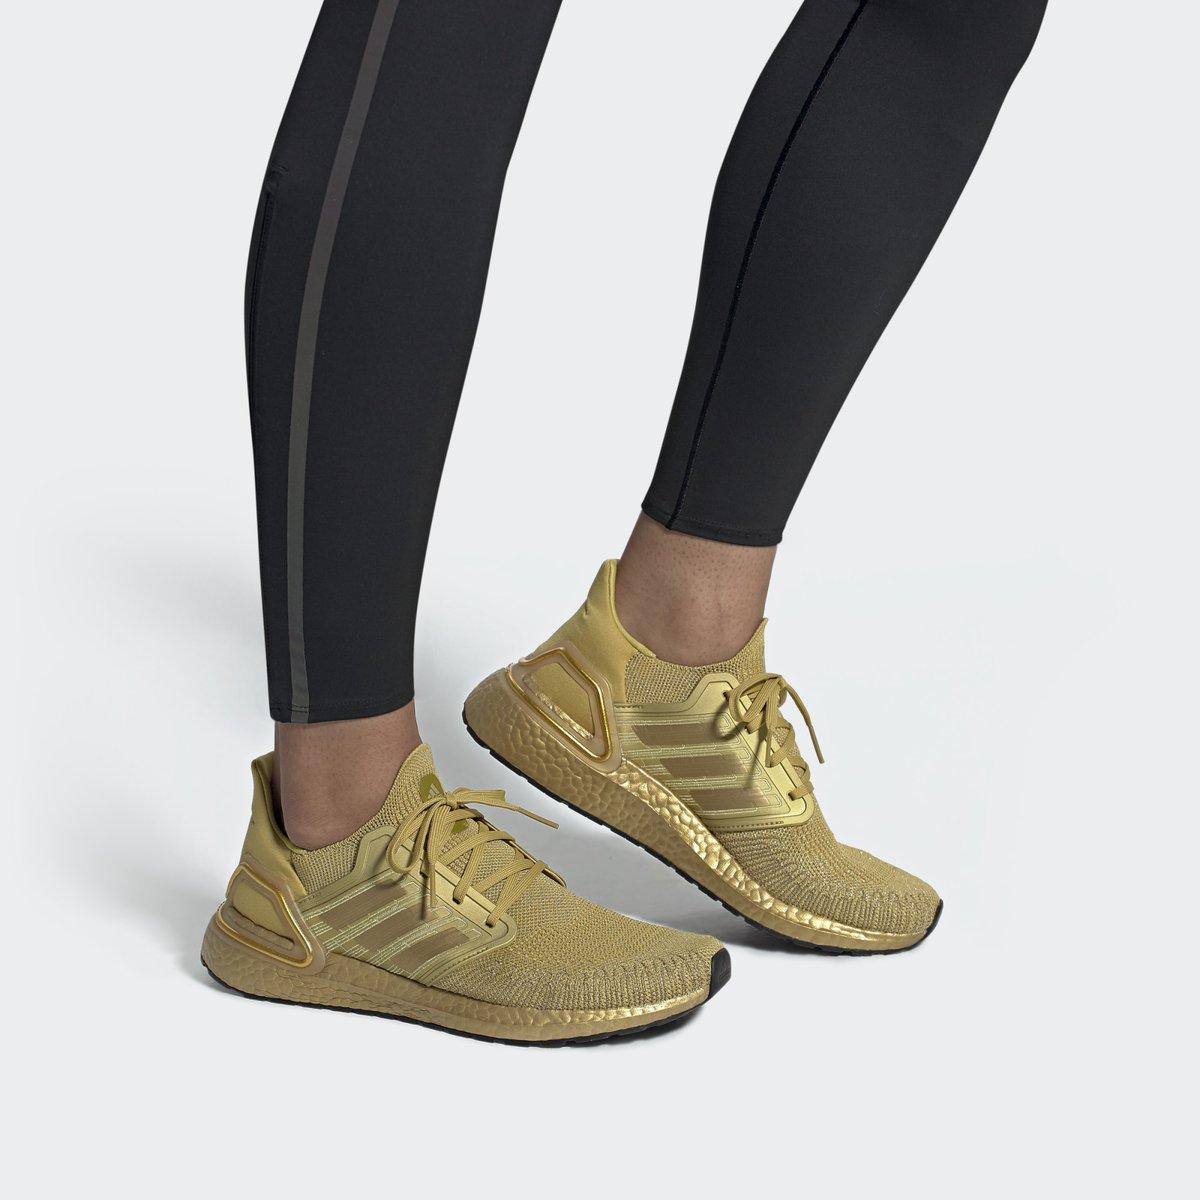 UltraBoost 20 'Gold Metallic'